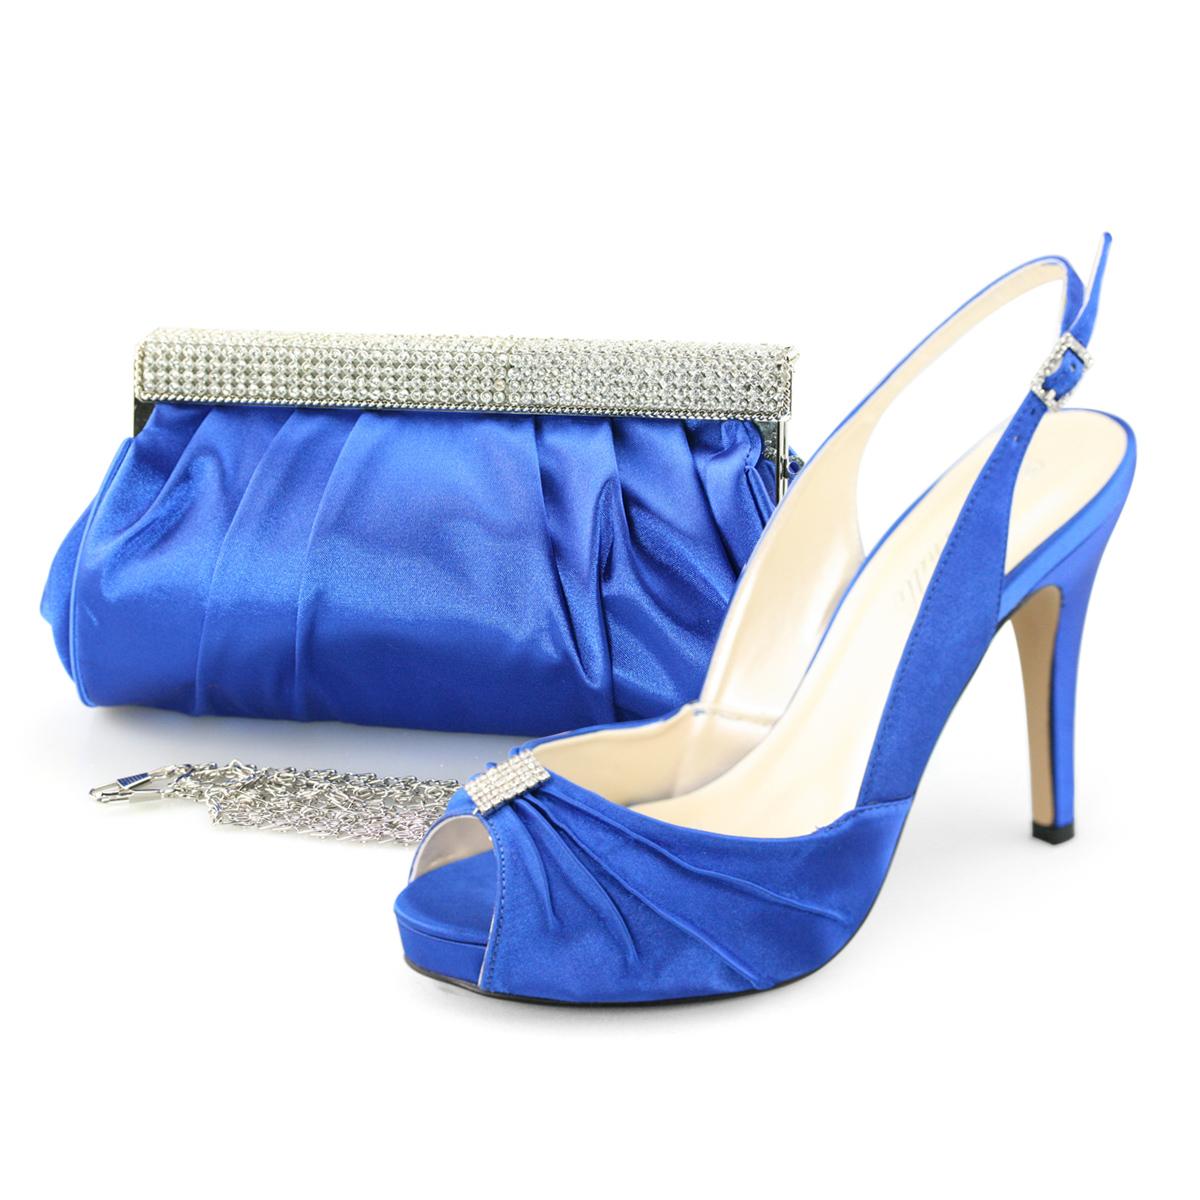 shoezy womens blue satin rhinestone evening prom dress